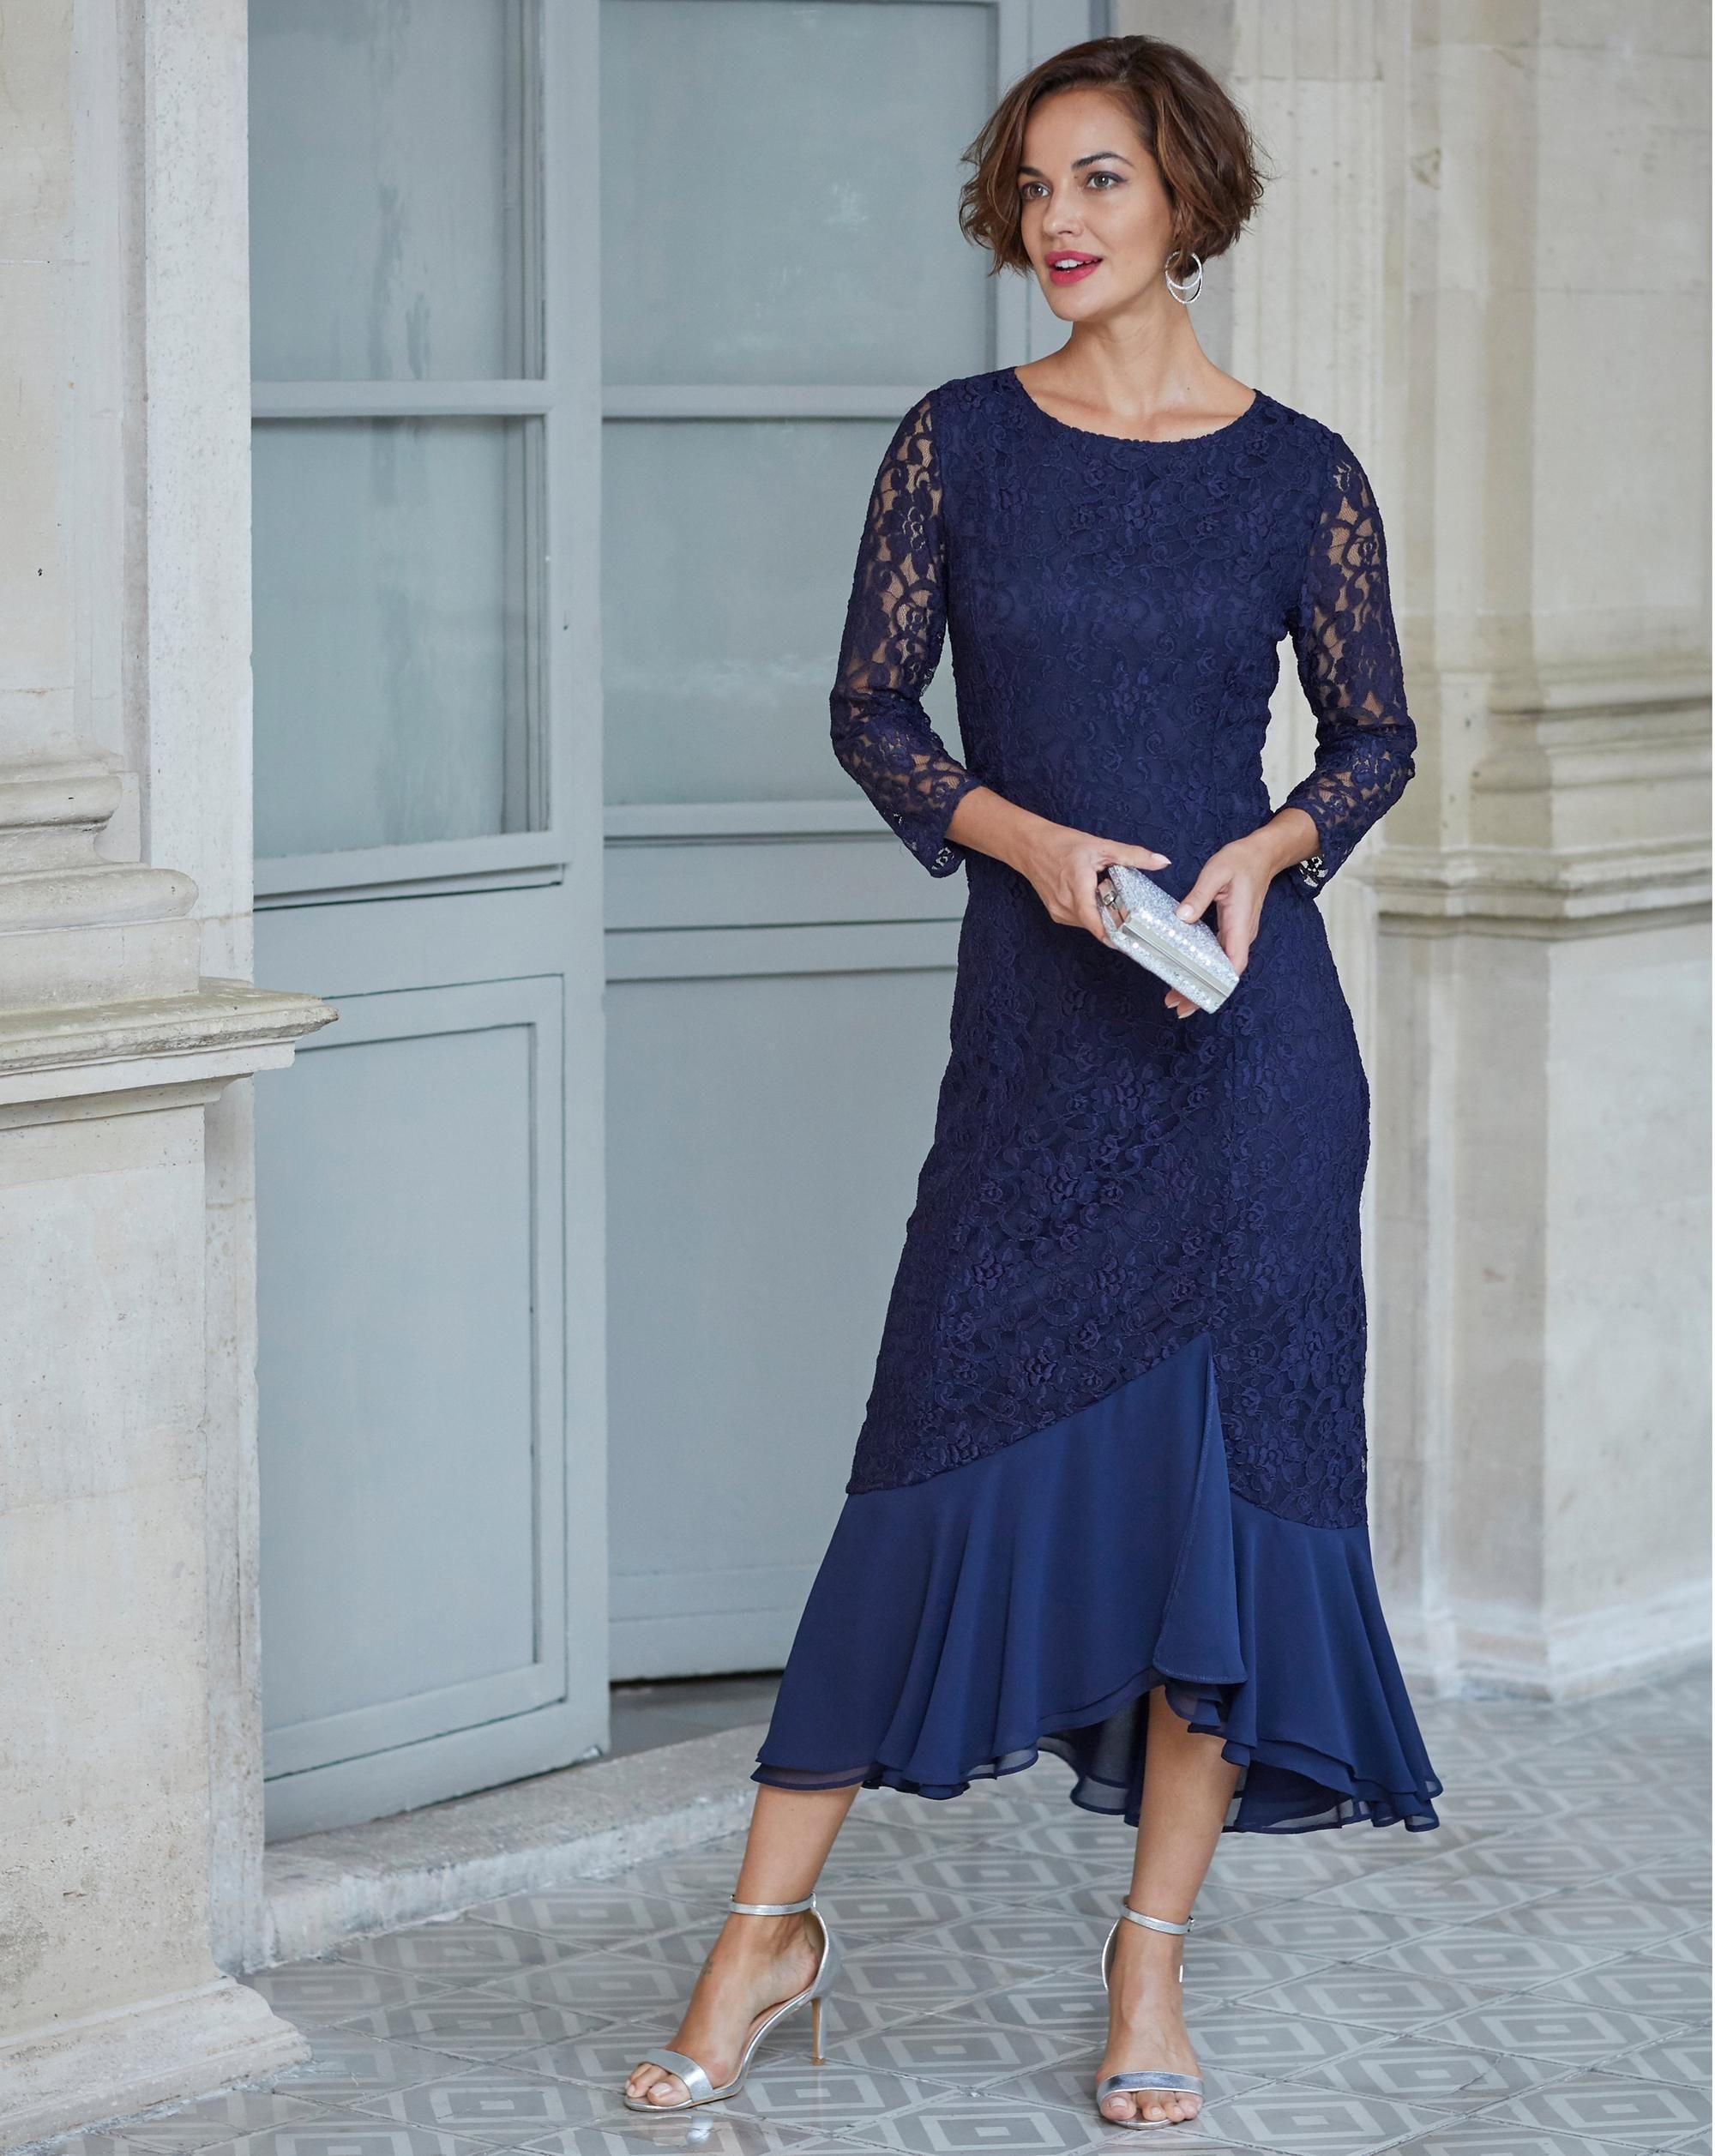 1920s Style Dresses 20s Dresses Women S Fashion Dresses Fashion Dresses Lace Dress [ 2514 x 2000 Pixel ]